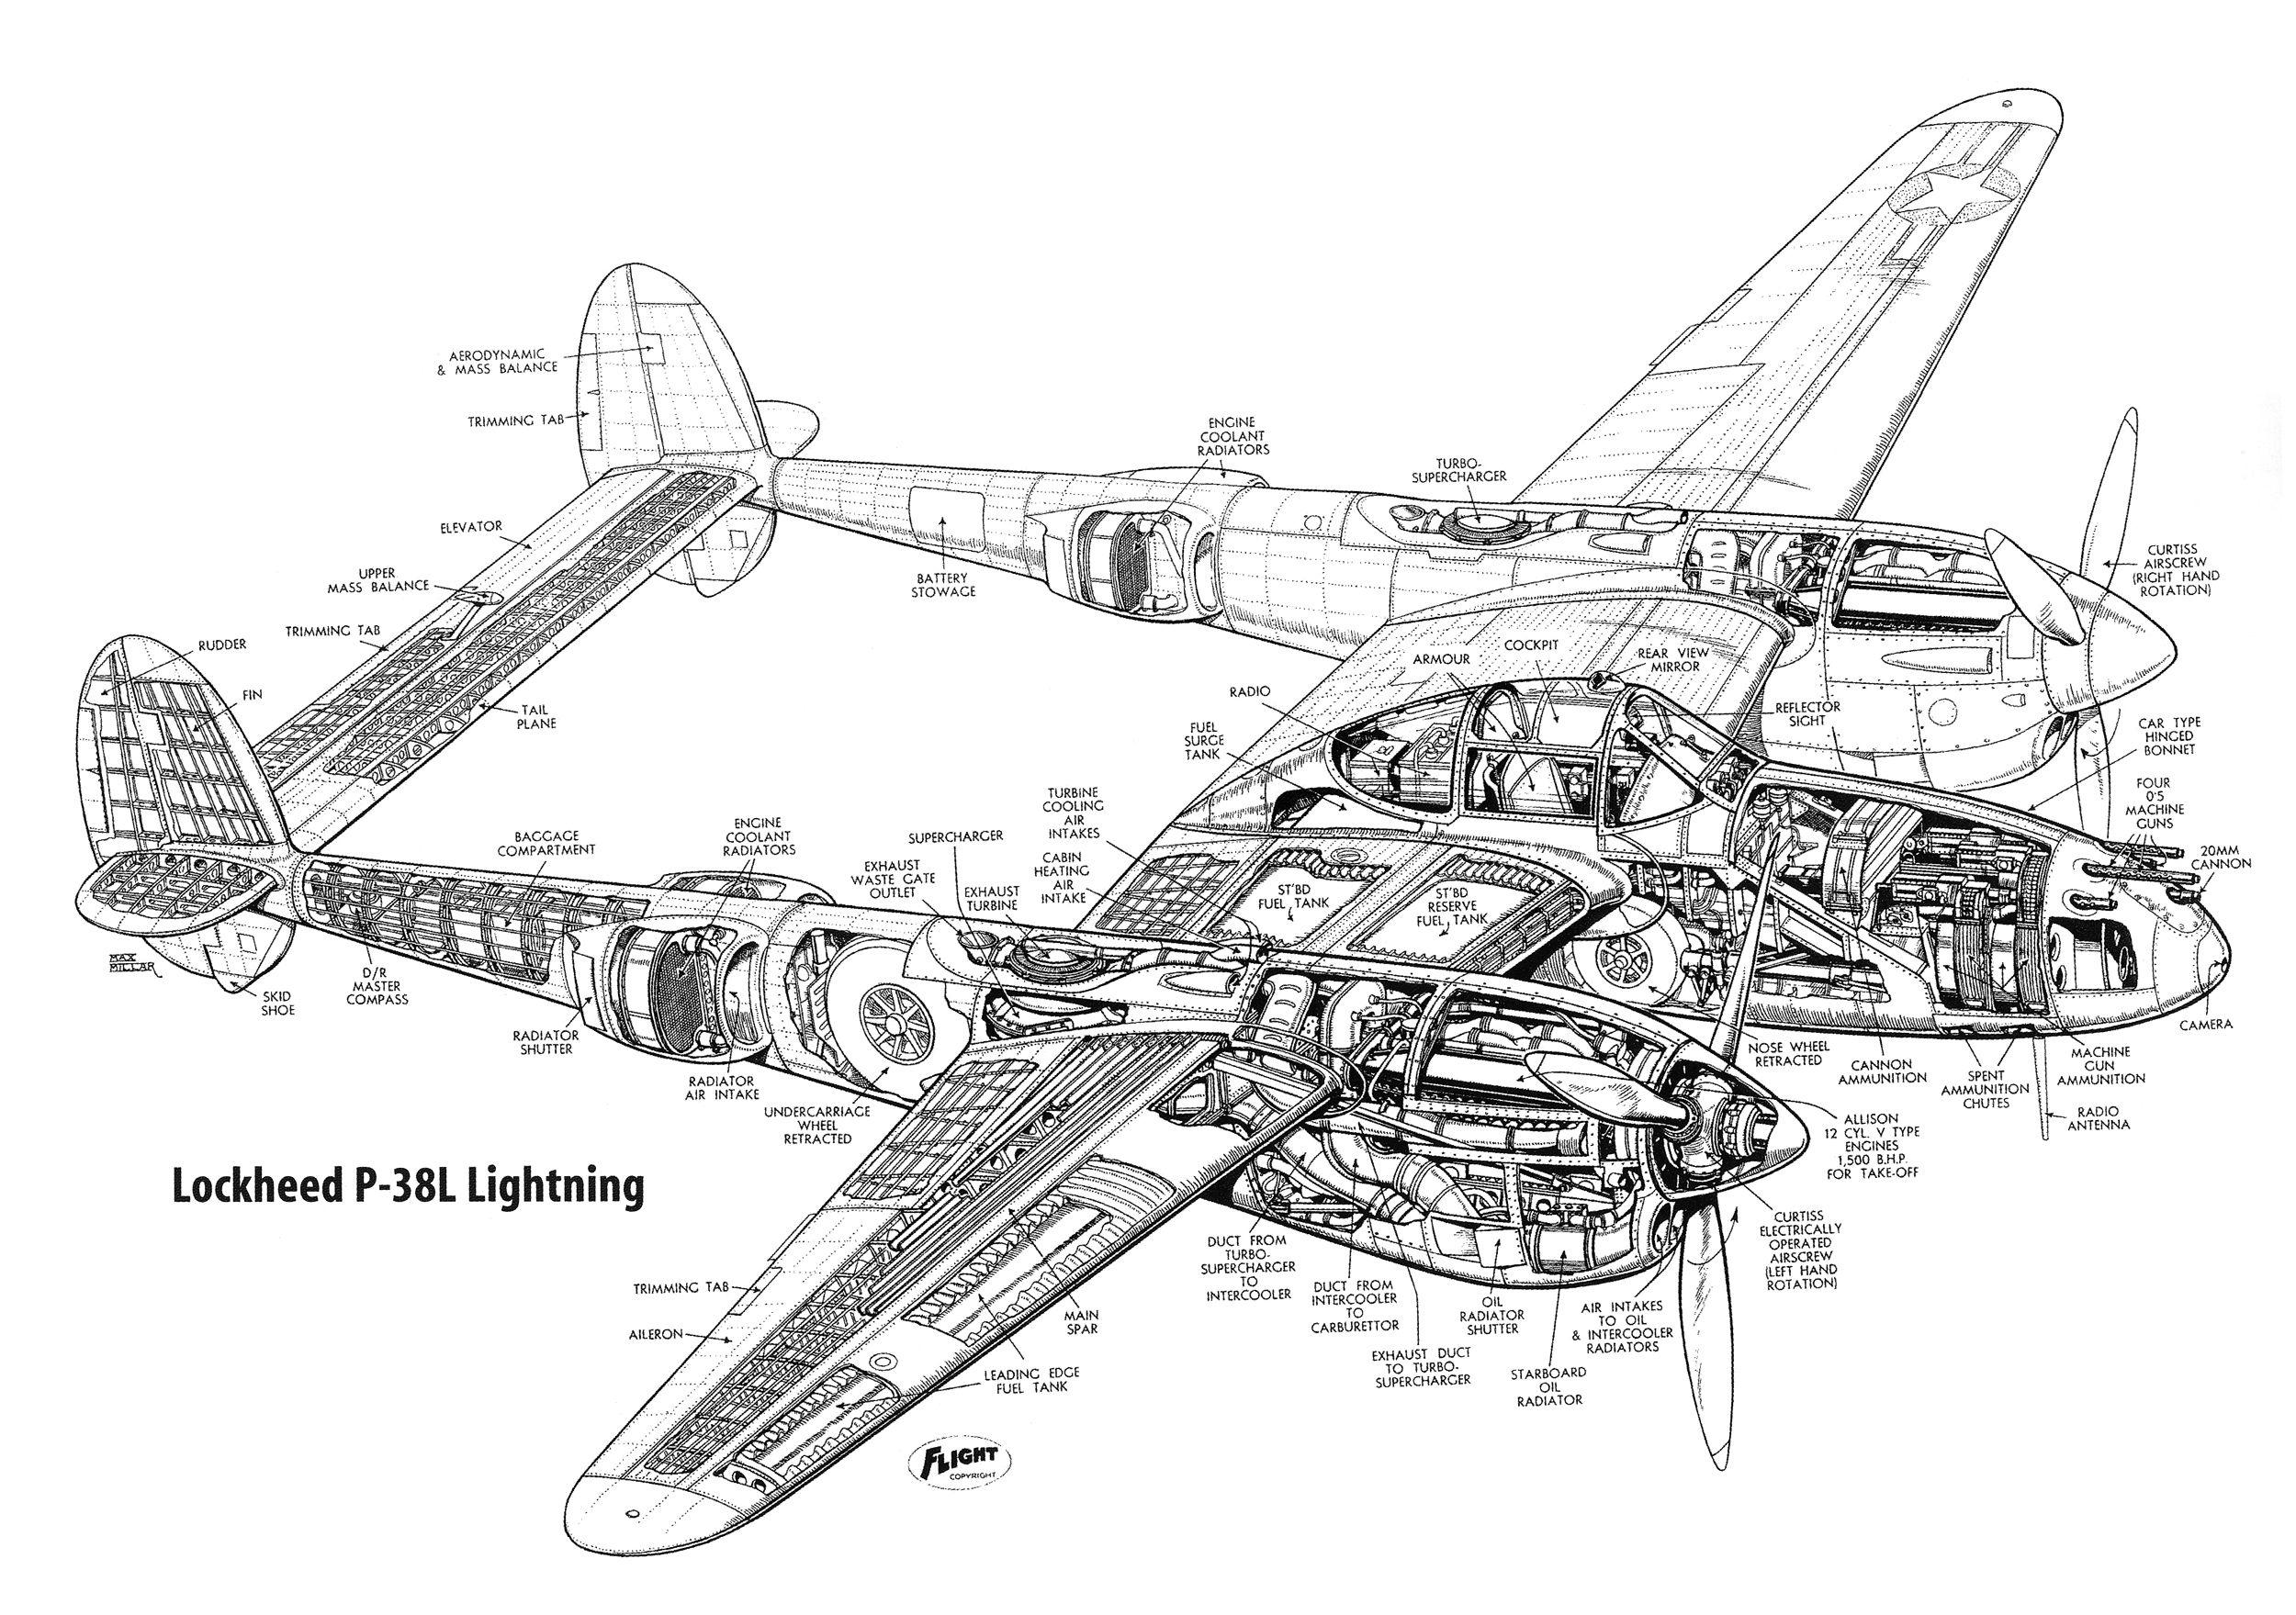 Ww2 Airplane Artwork